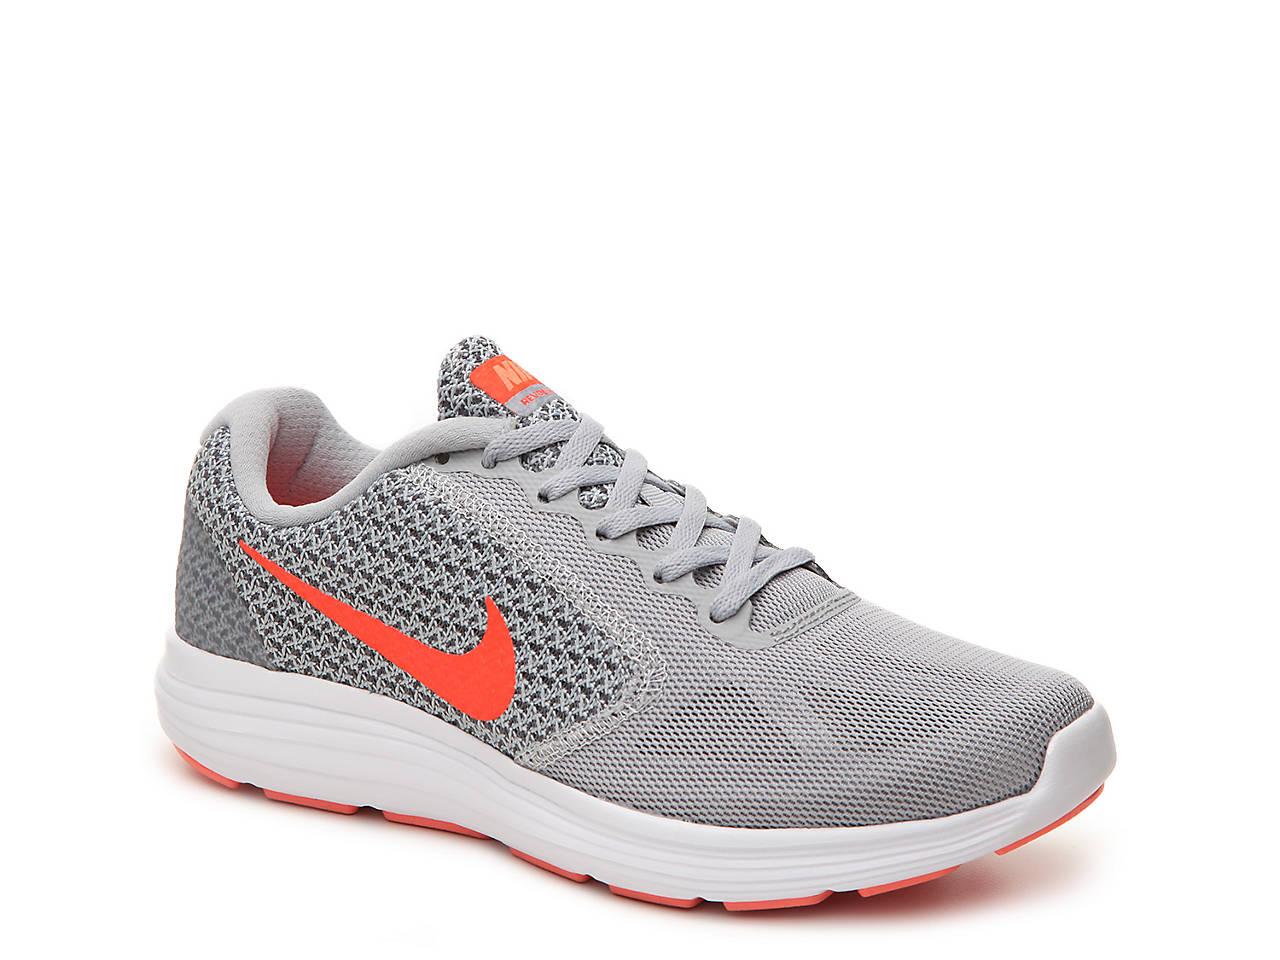 87da876cc079 Nike Revolution 3 Lightweight Running Shoe - Women s Women s Shoes